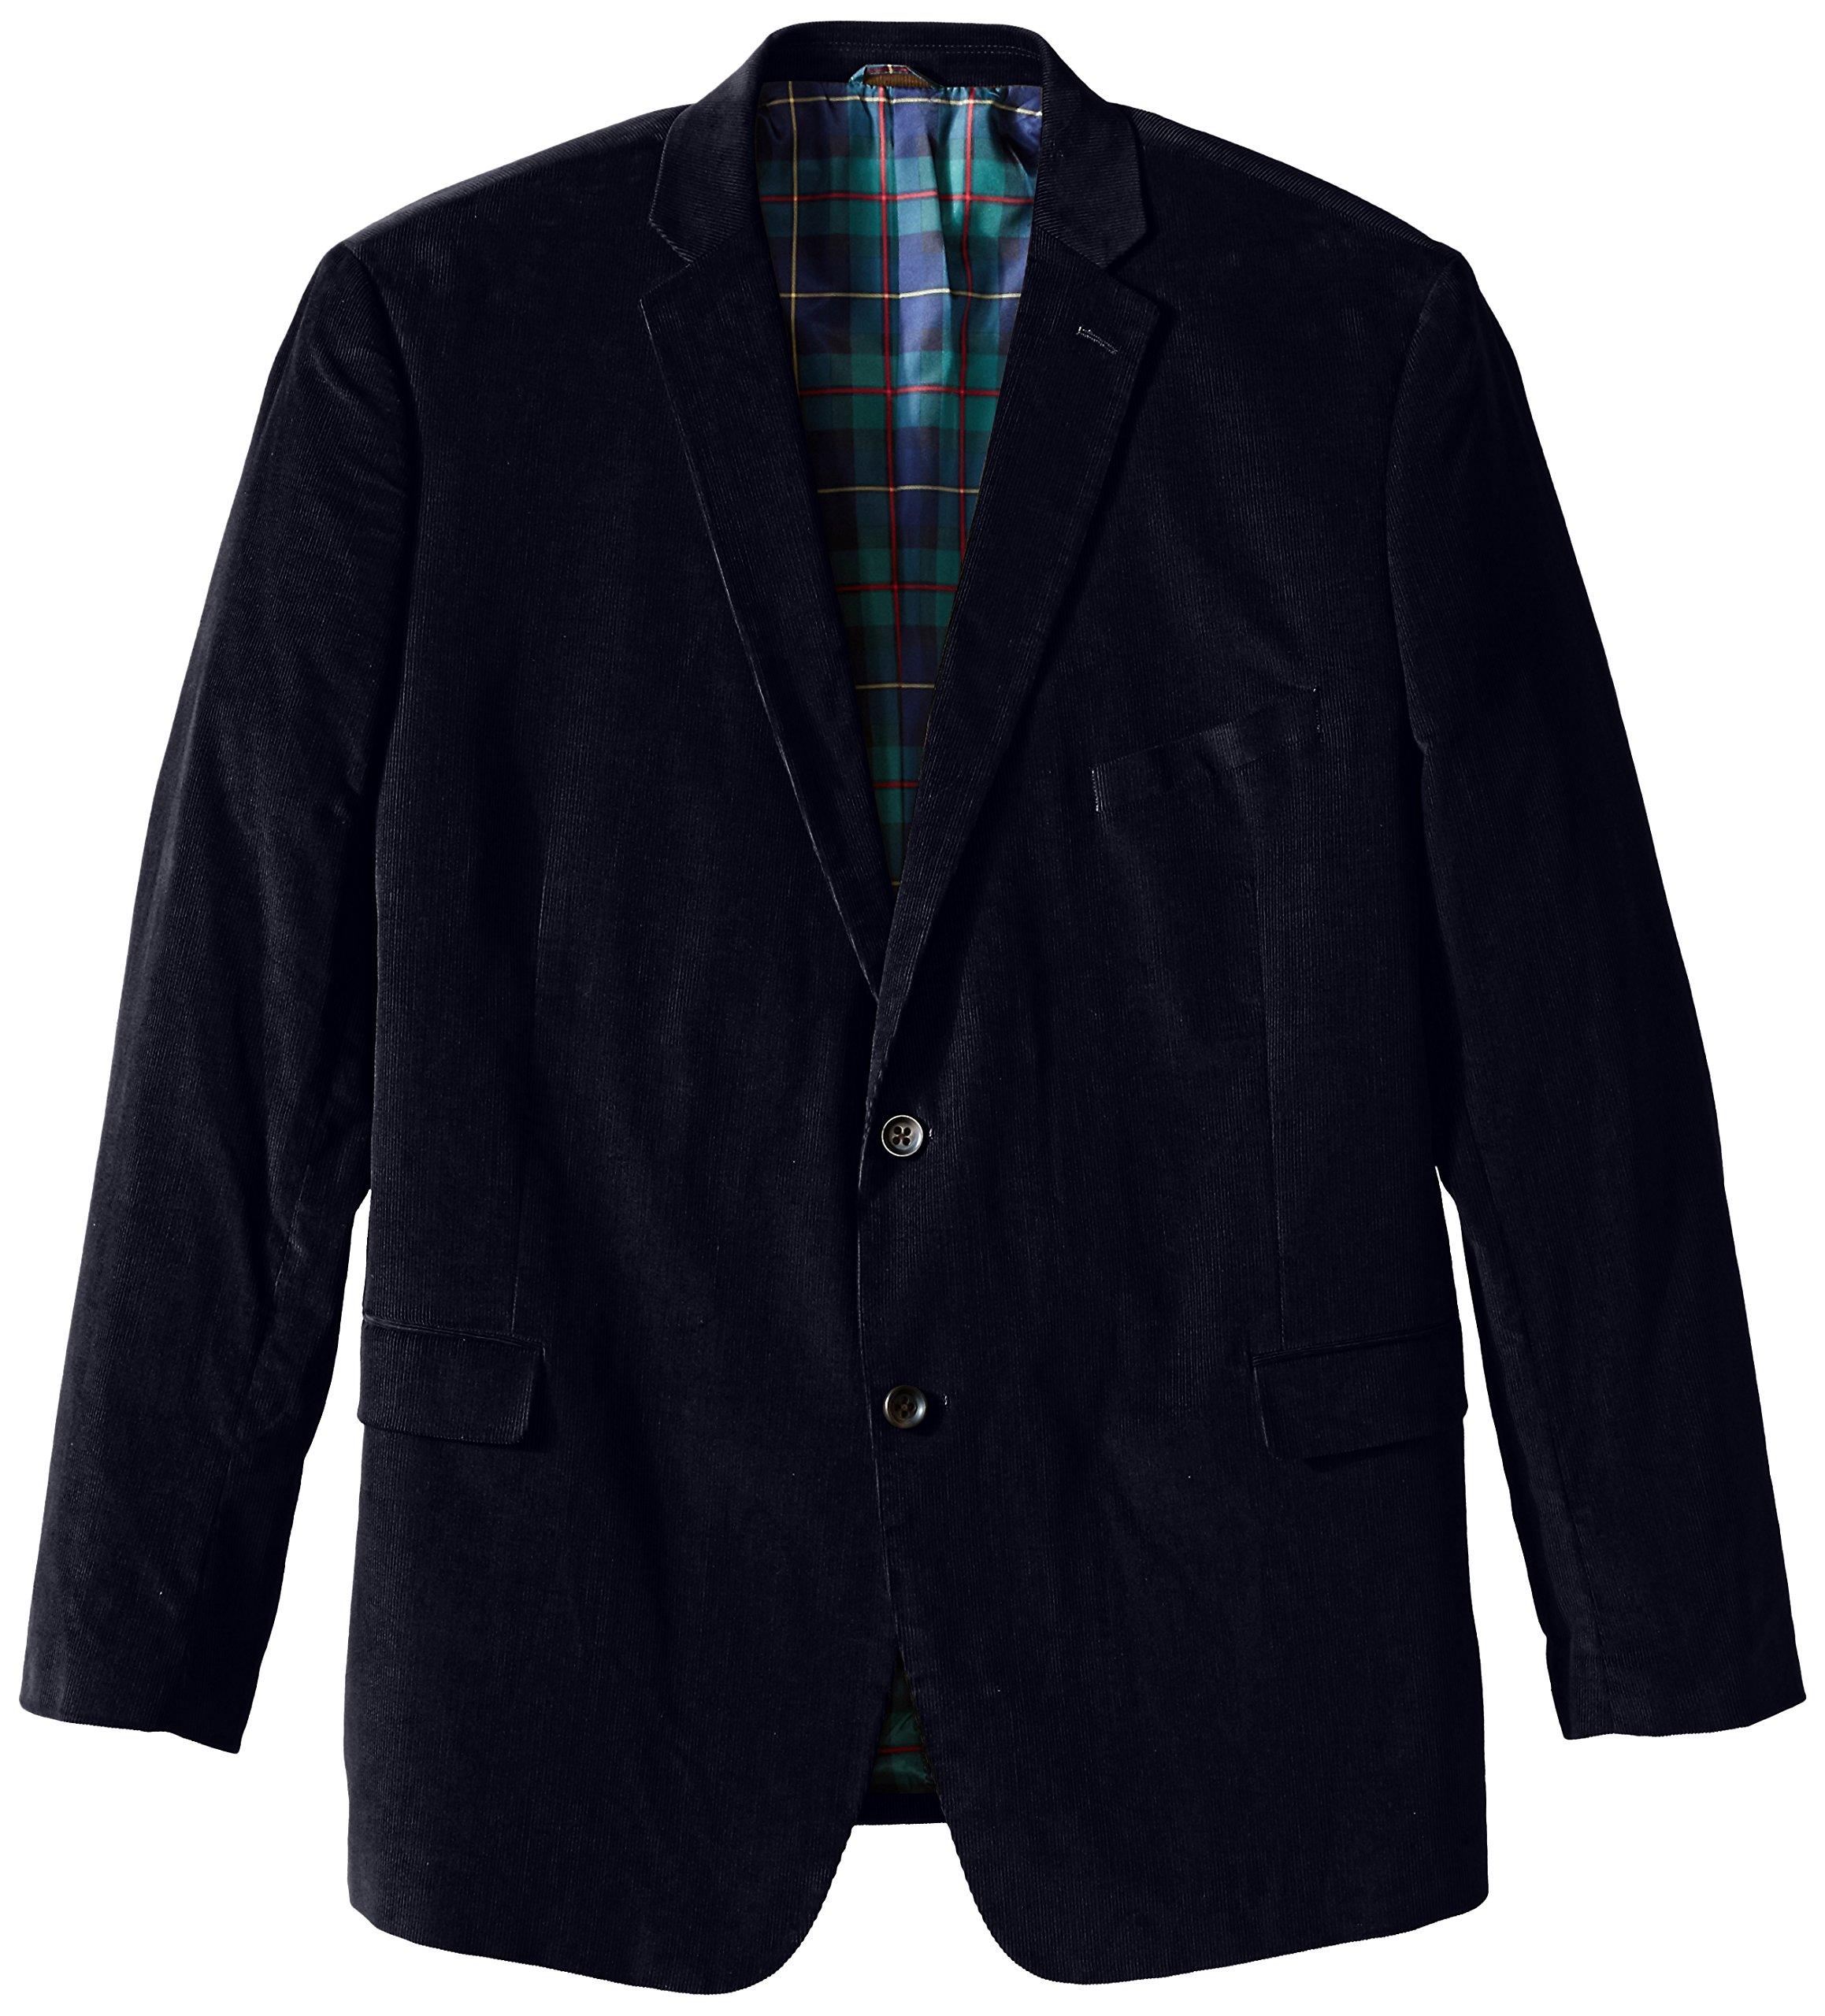 U.S. Polo Assn. Men's Big-Tall Cotton Corduroy Sport Coat, Navy, 52 Long